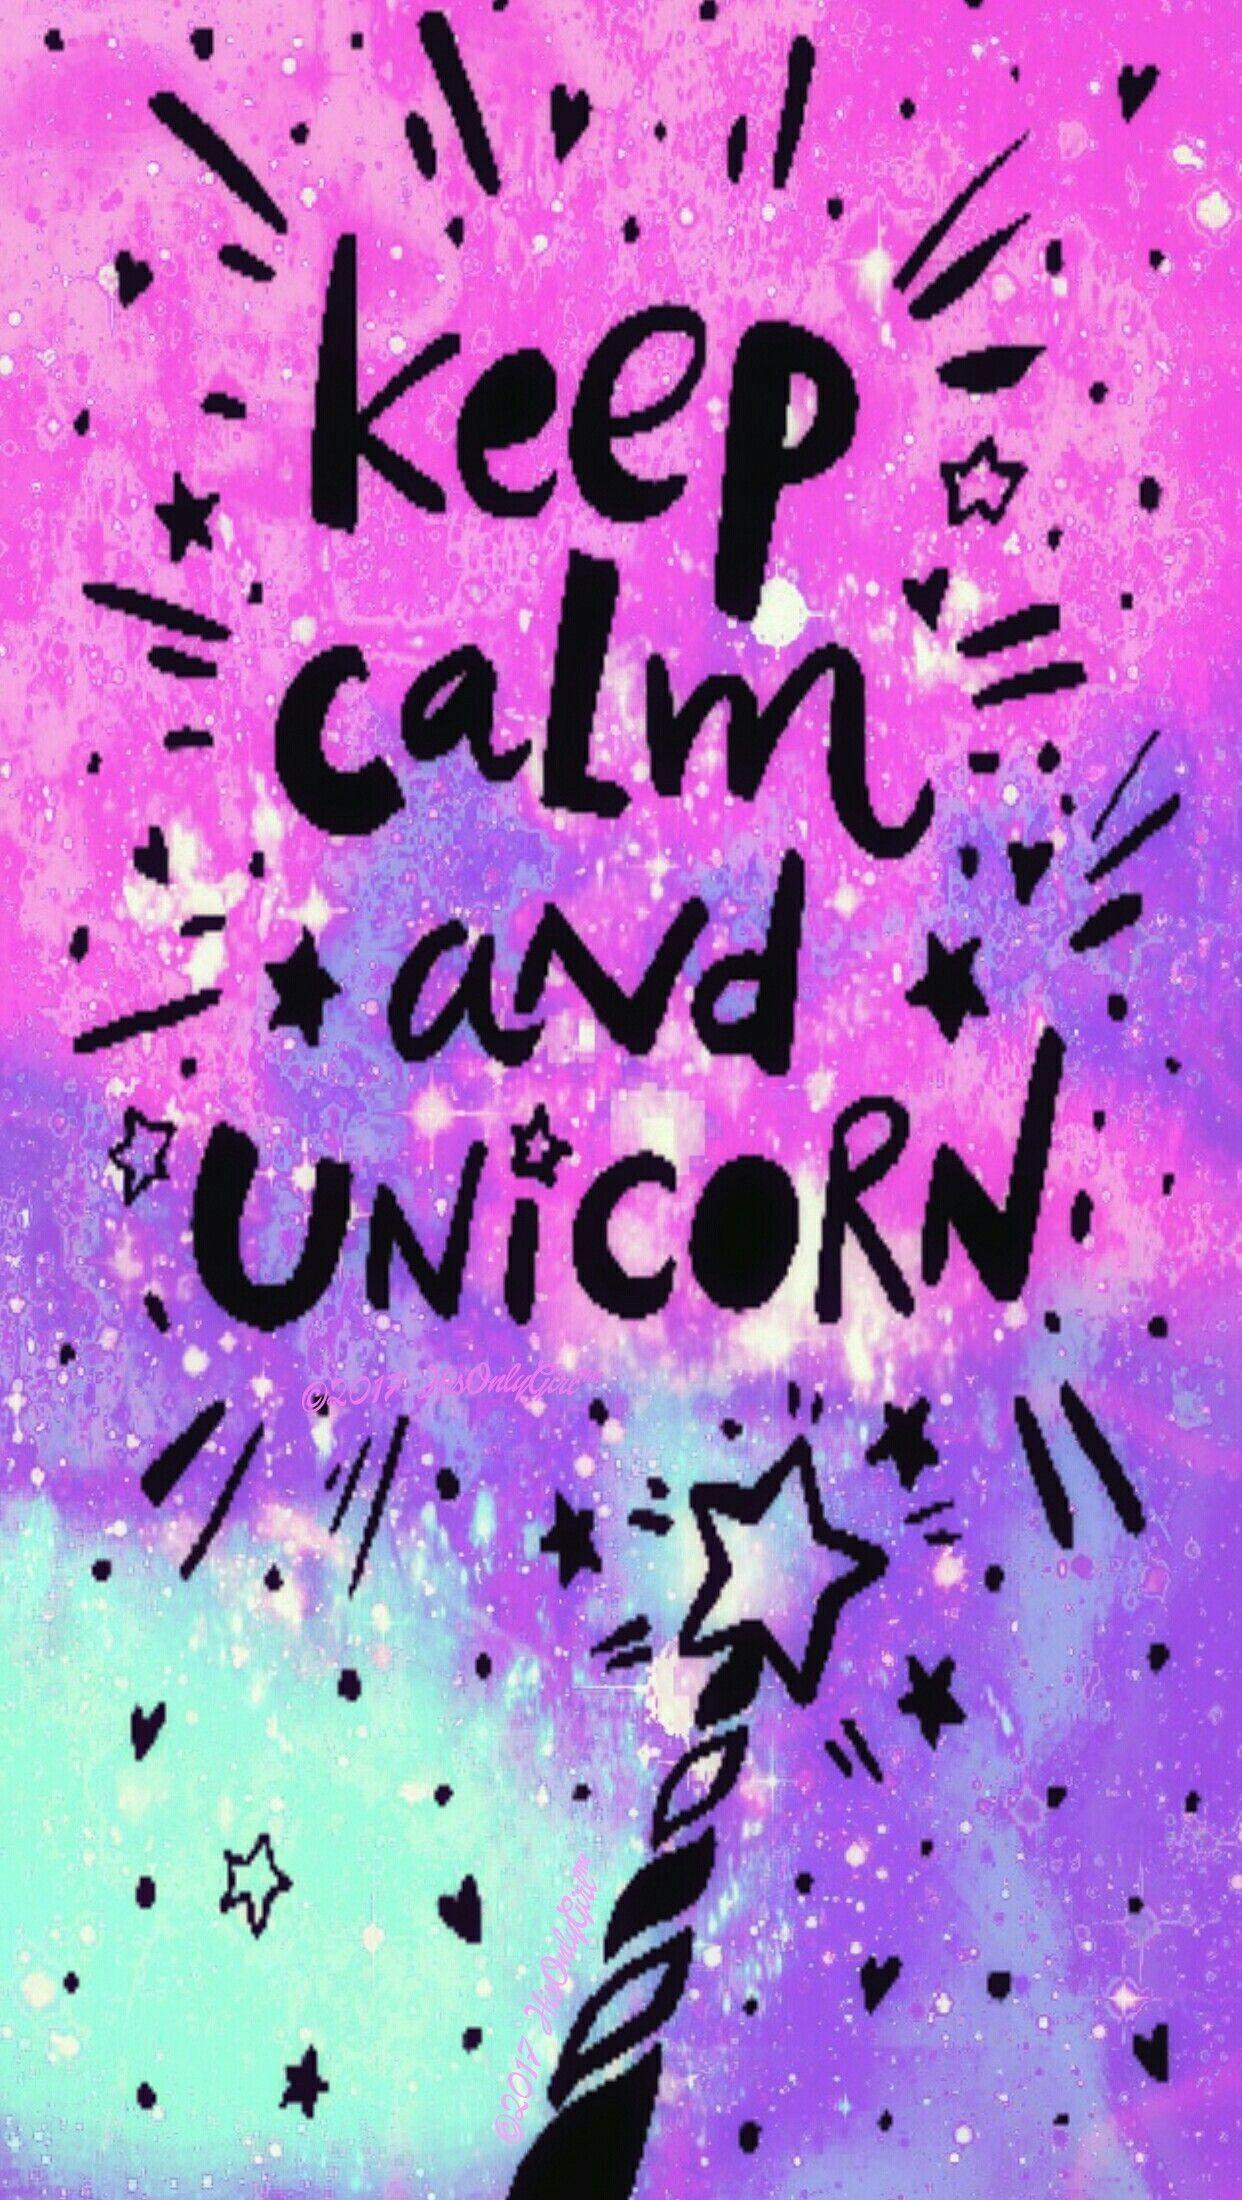 Pink Unicorn Wallpaper 54+ images